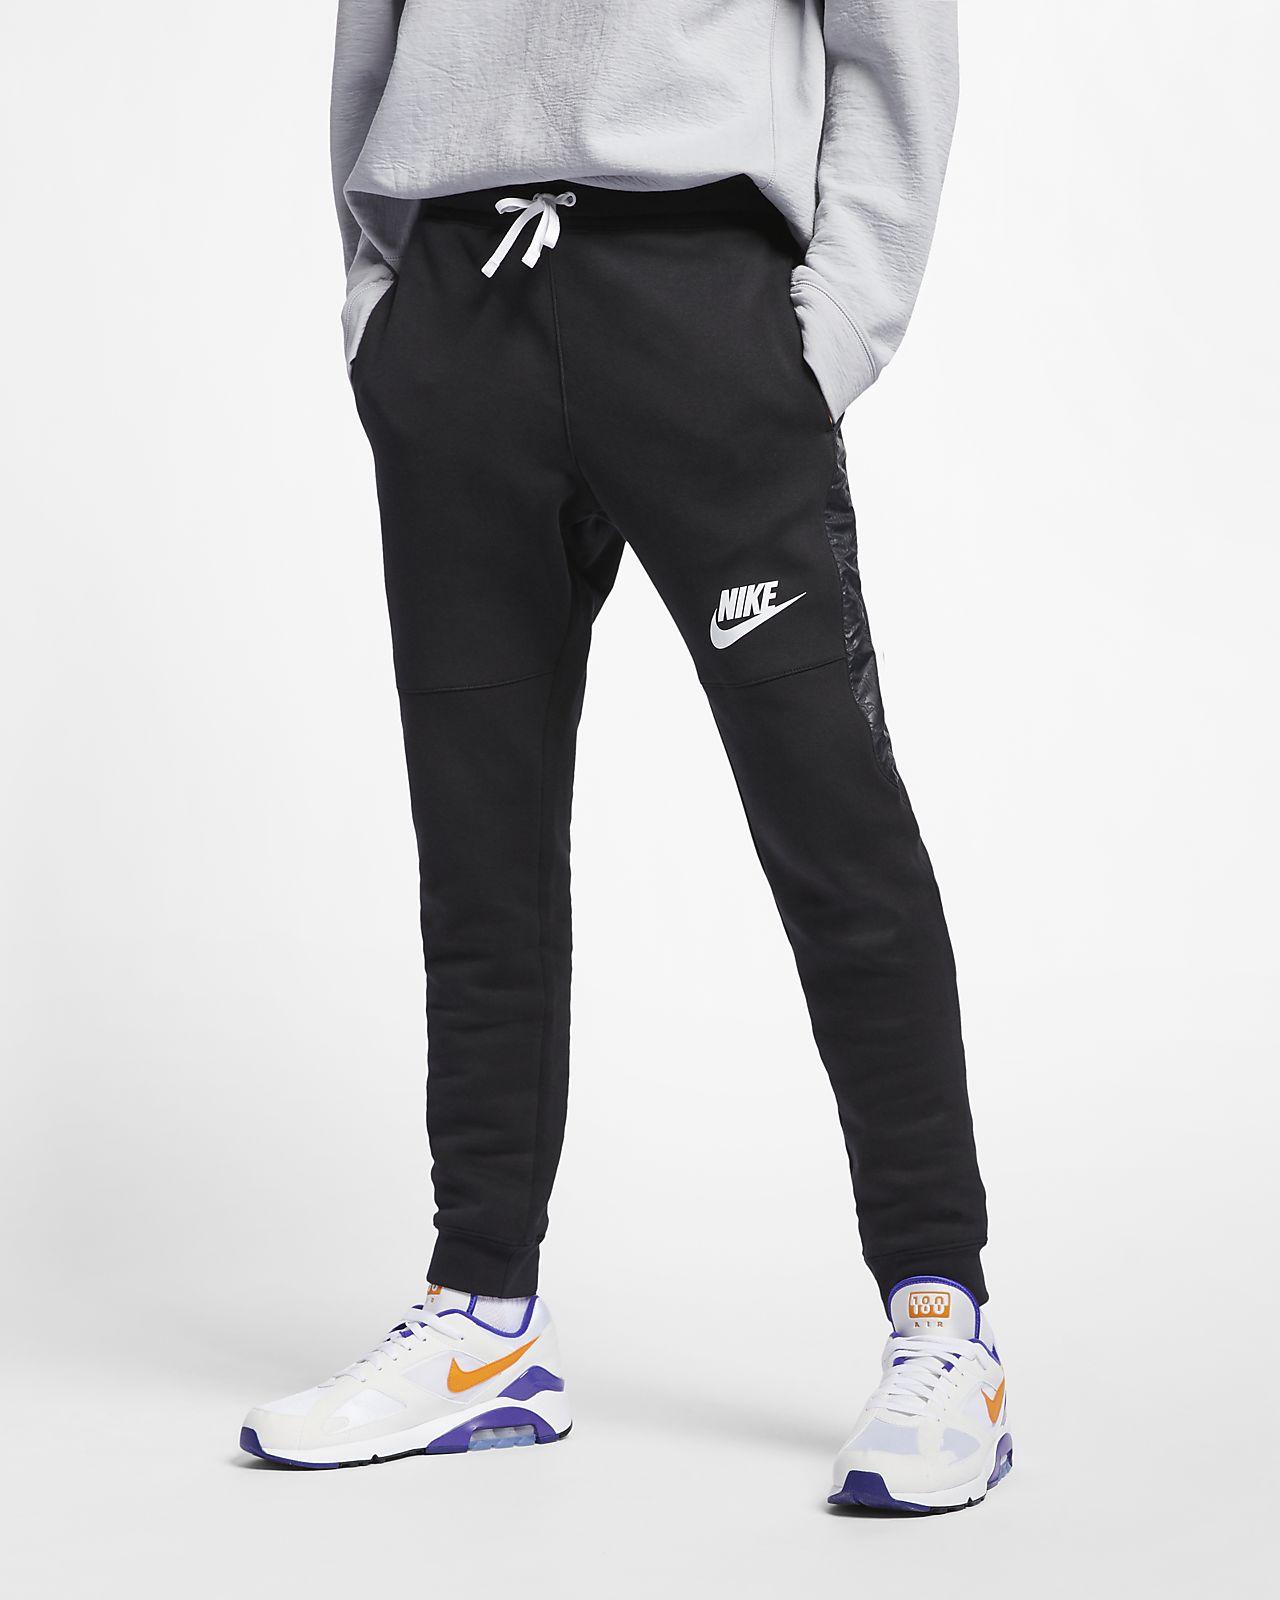 the latest e958c 7b0b0 Low Resolution Nike Sportswear Men s Joggers Nike Sportswear Men s Joggers